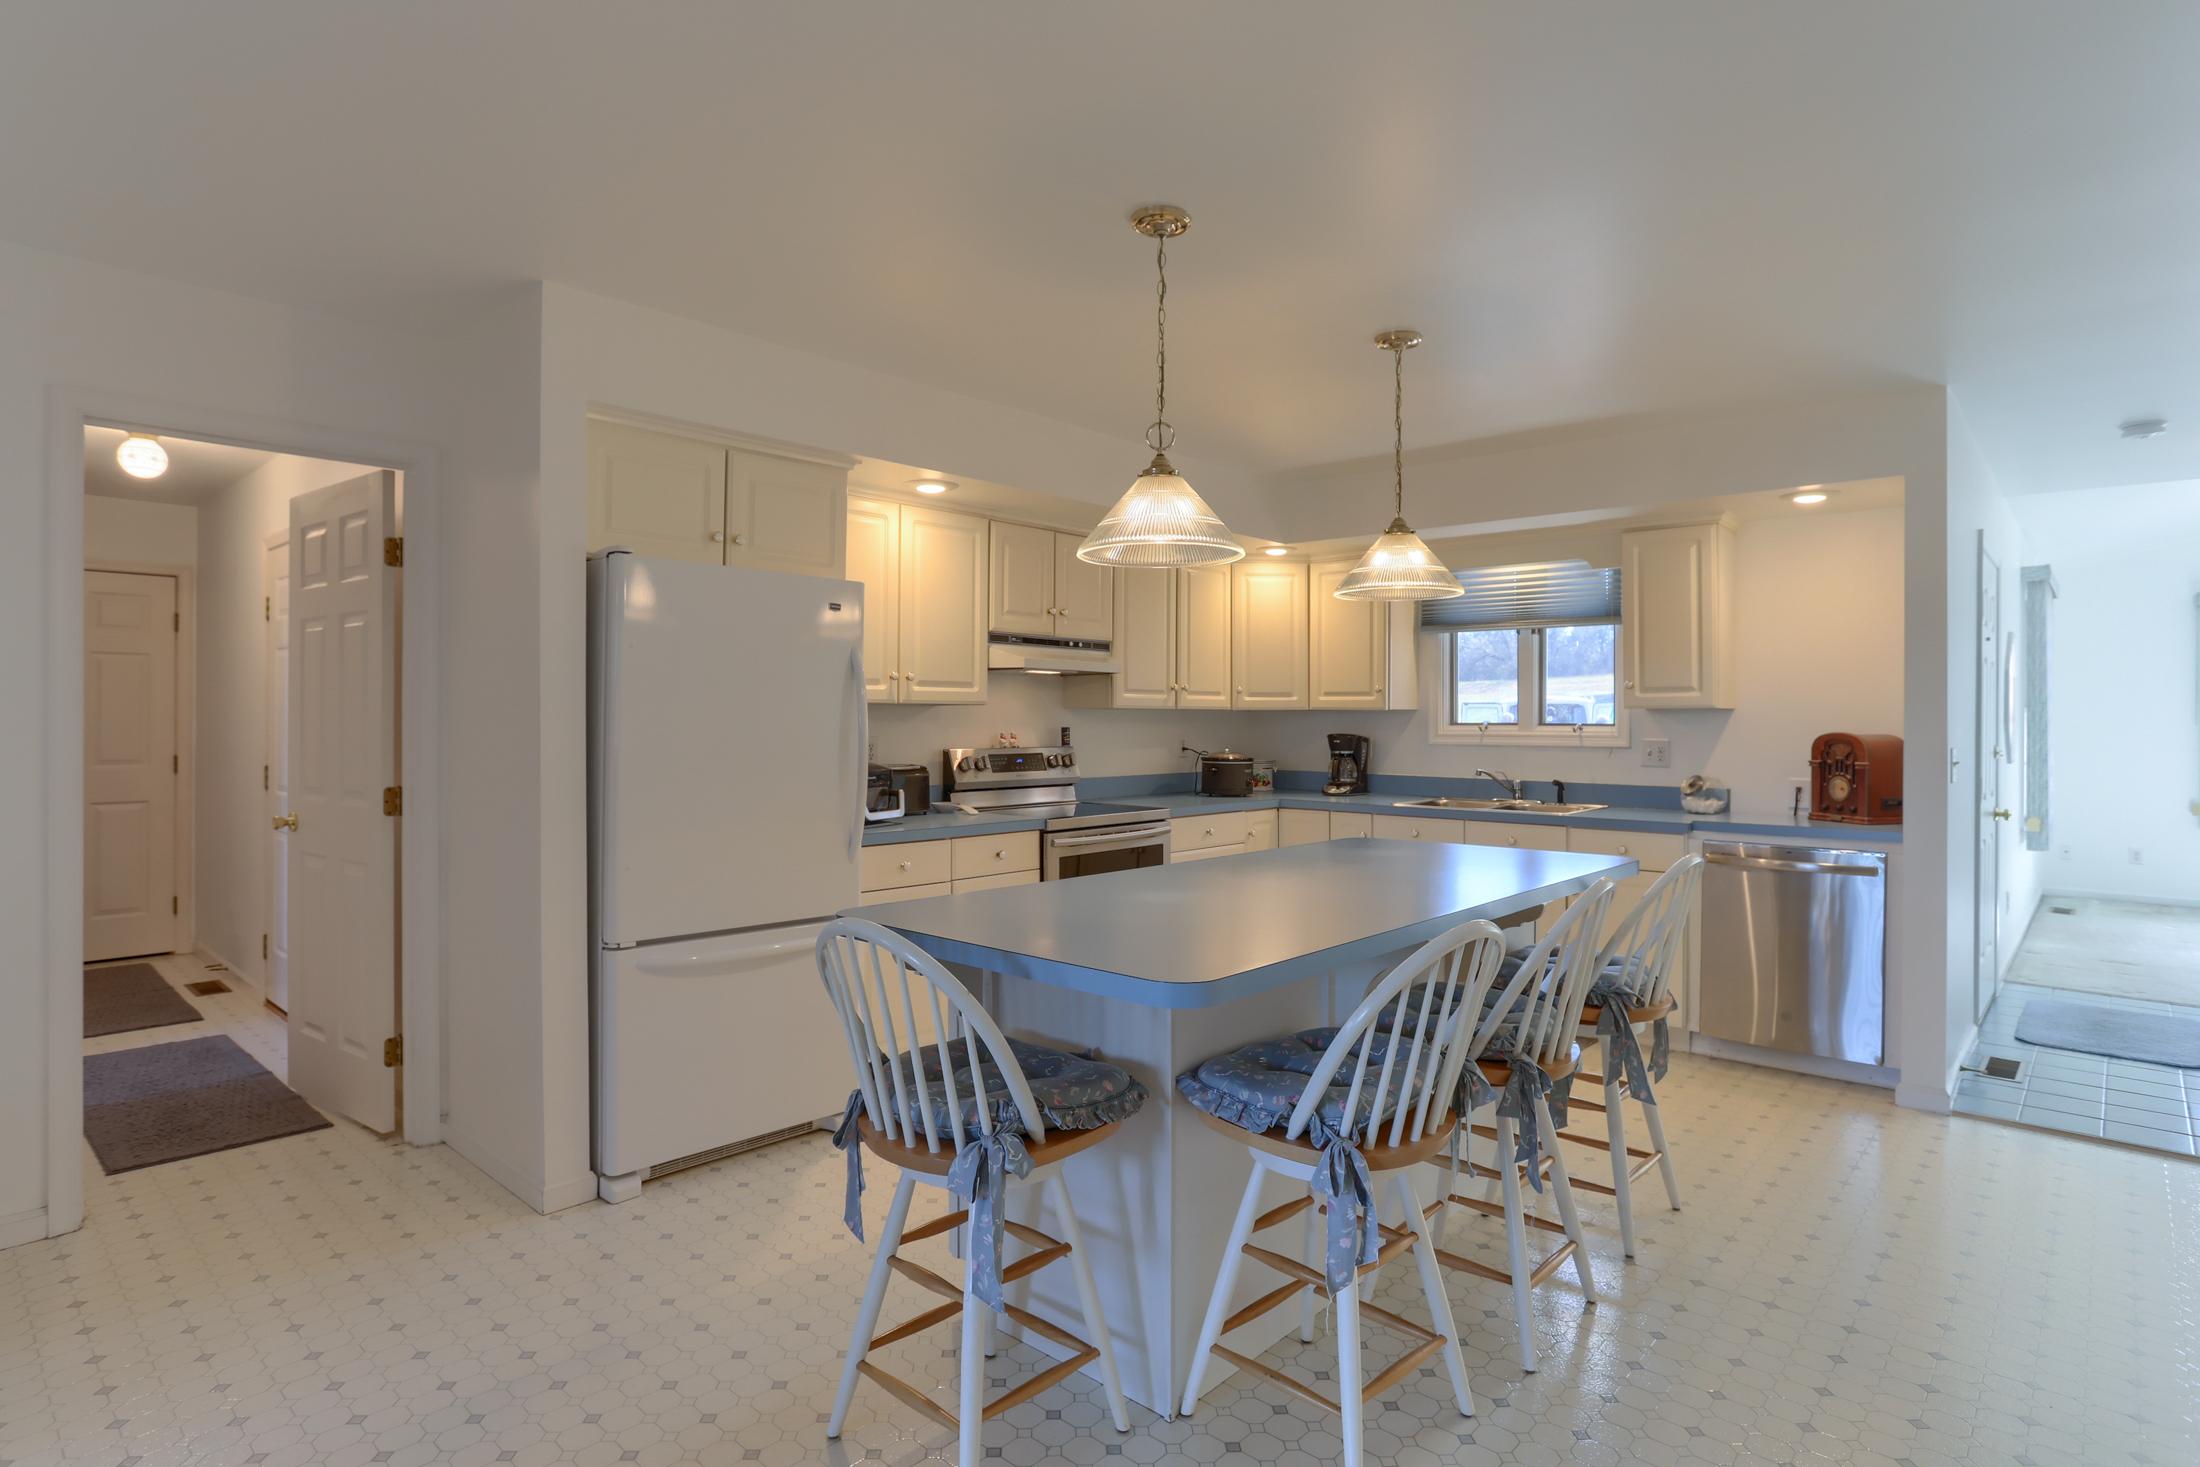 26 W. Strack Drive - Kitchen